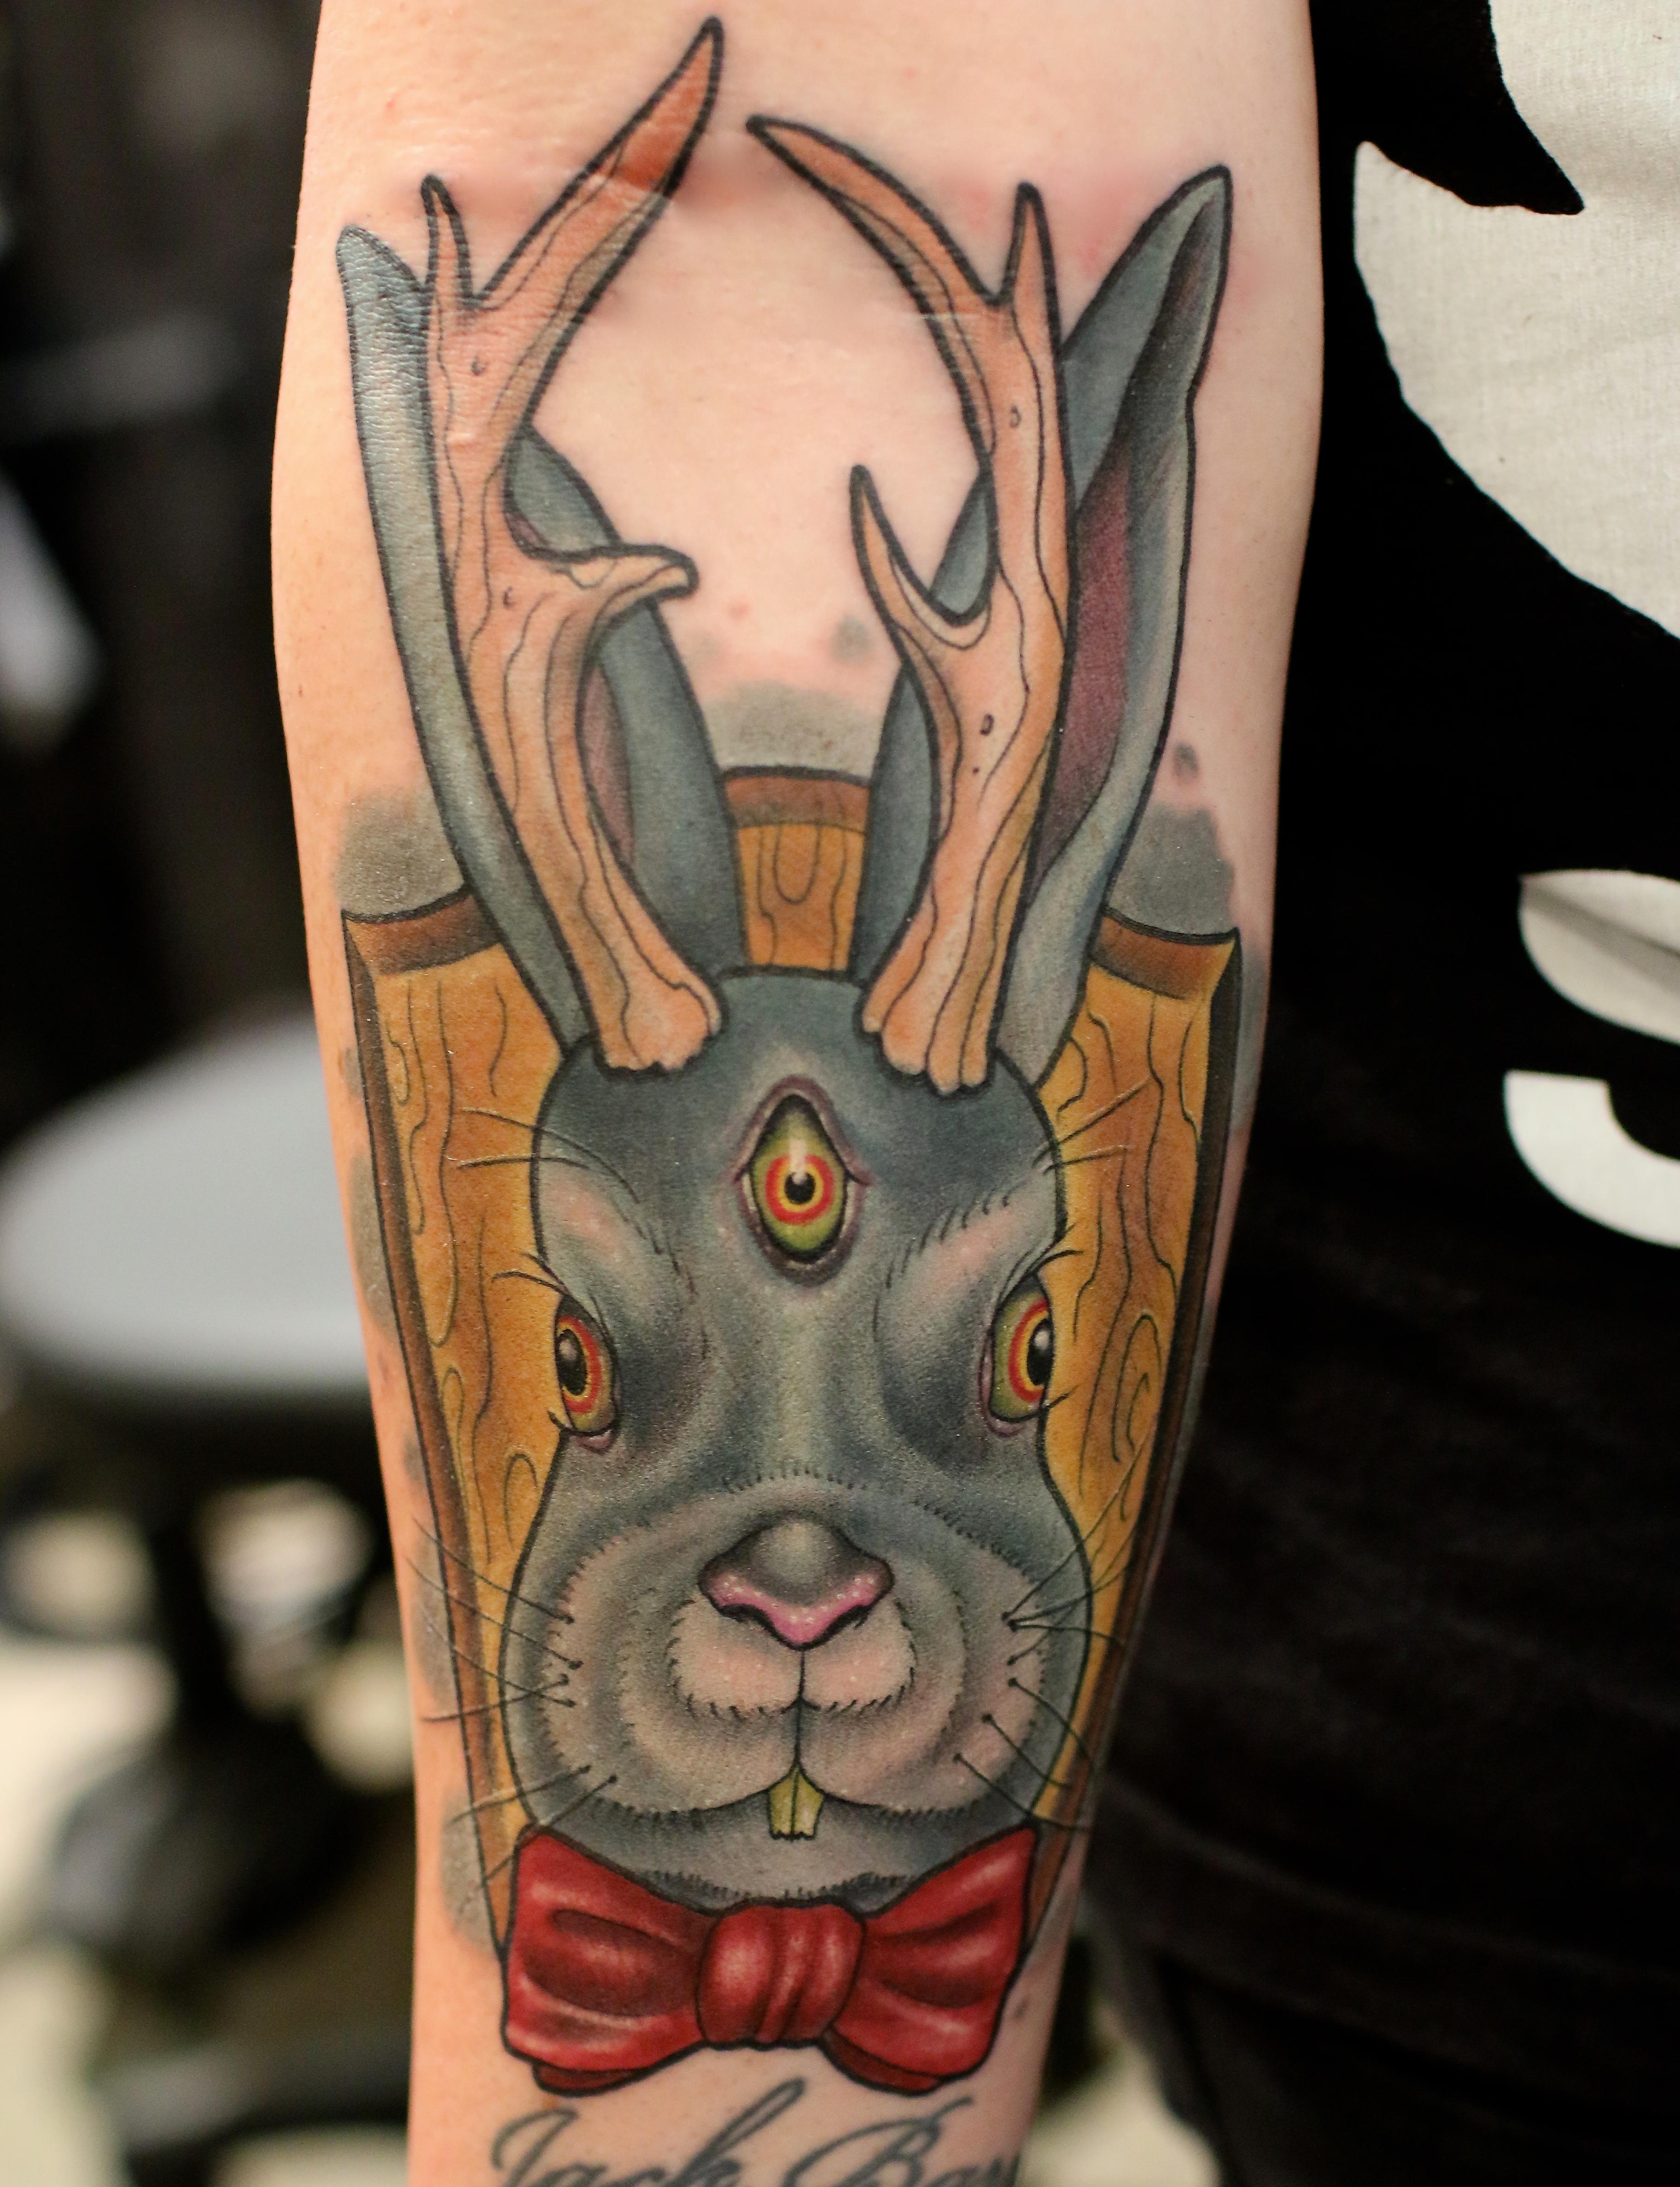 TyATX - Tattoo Artist Austin, Texas